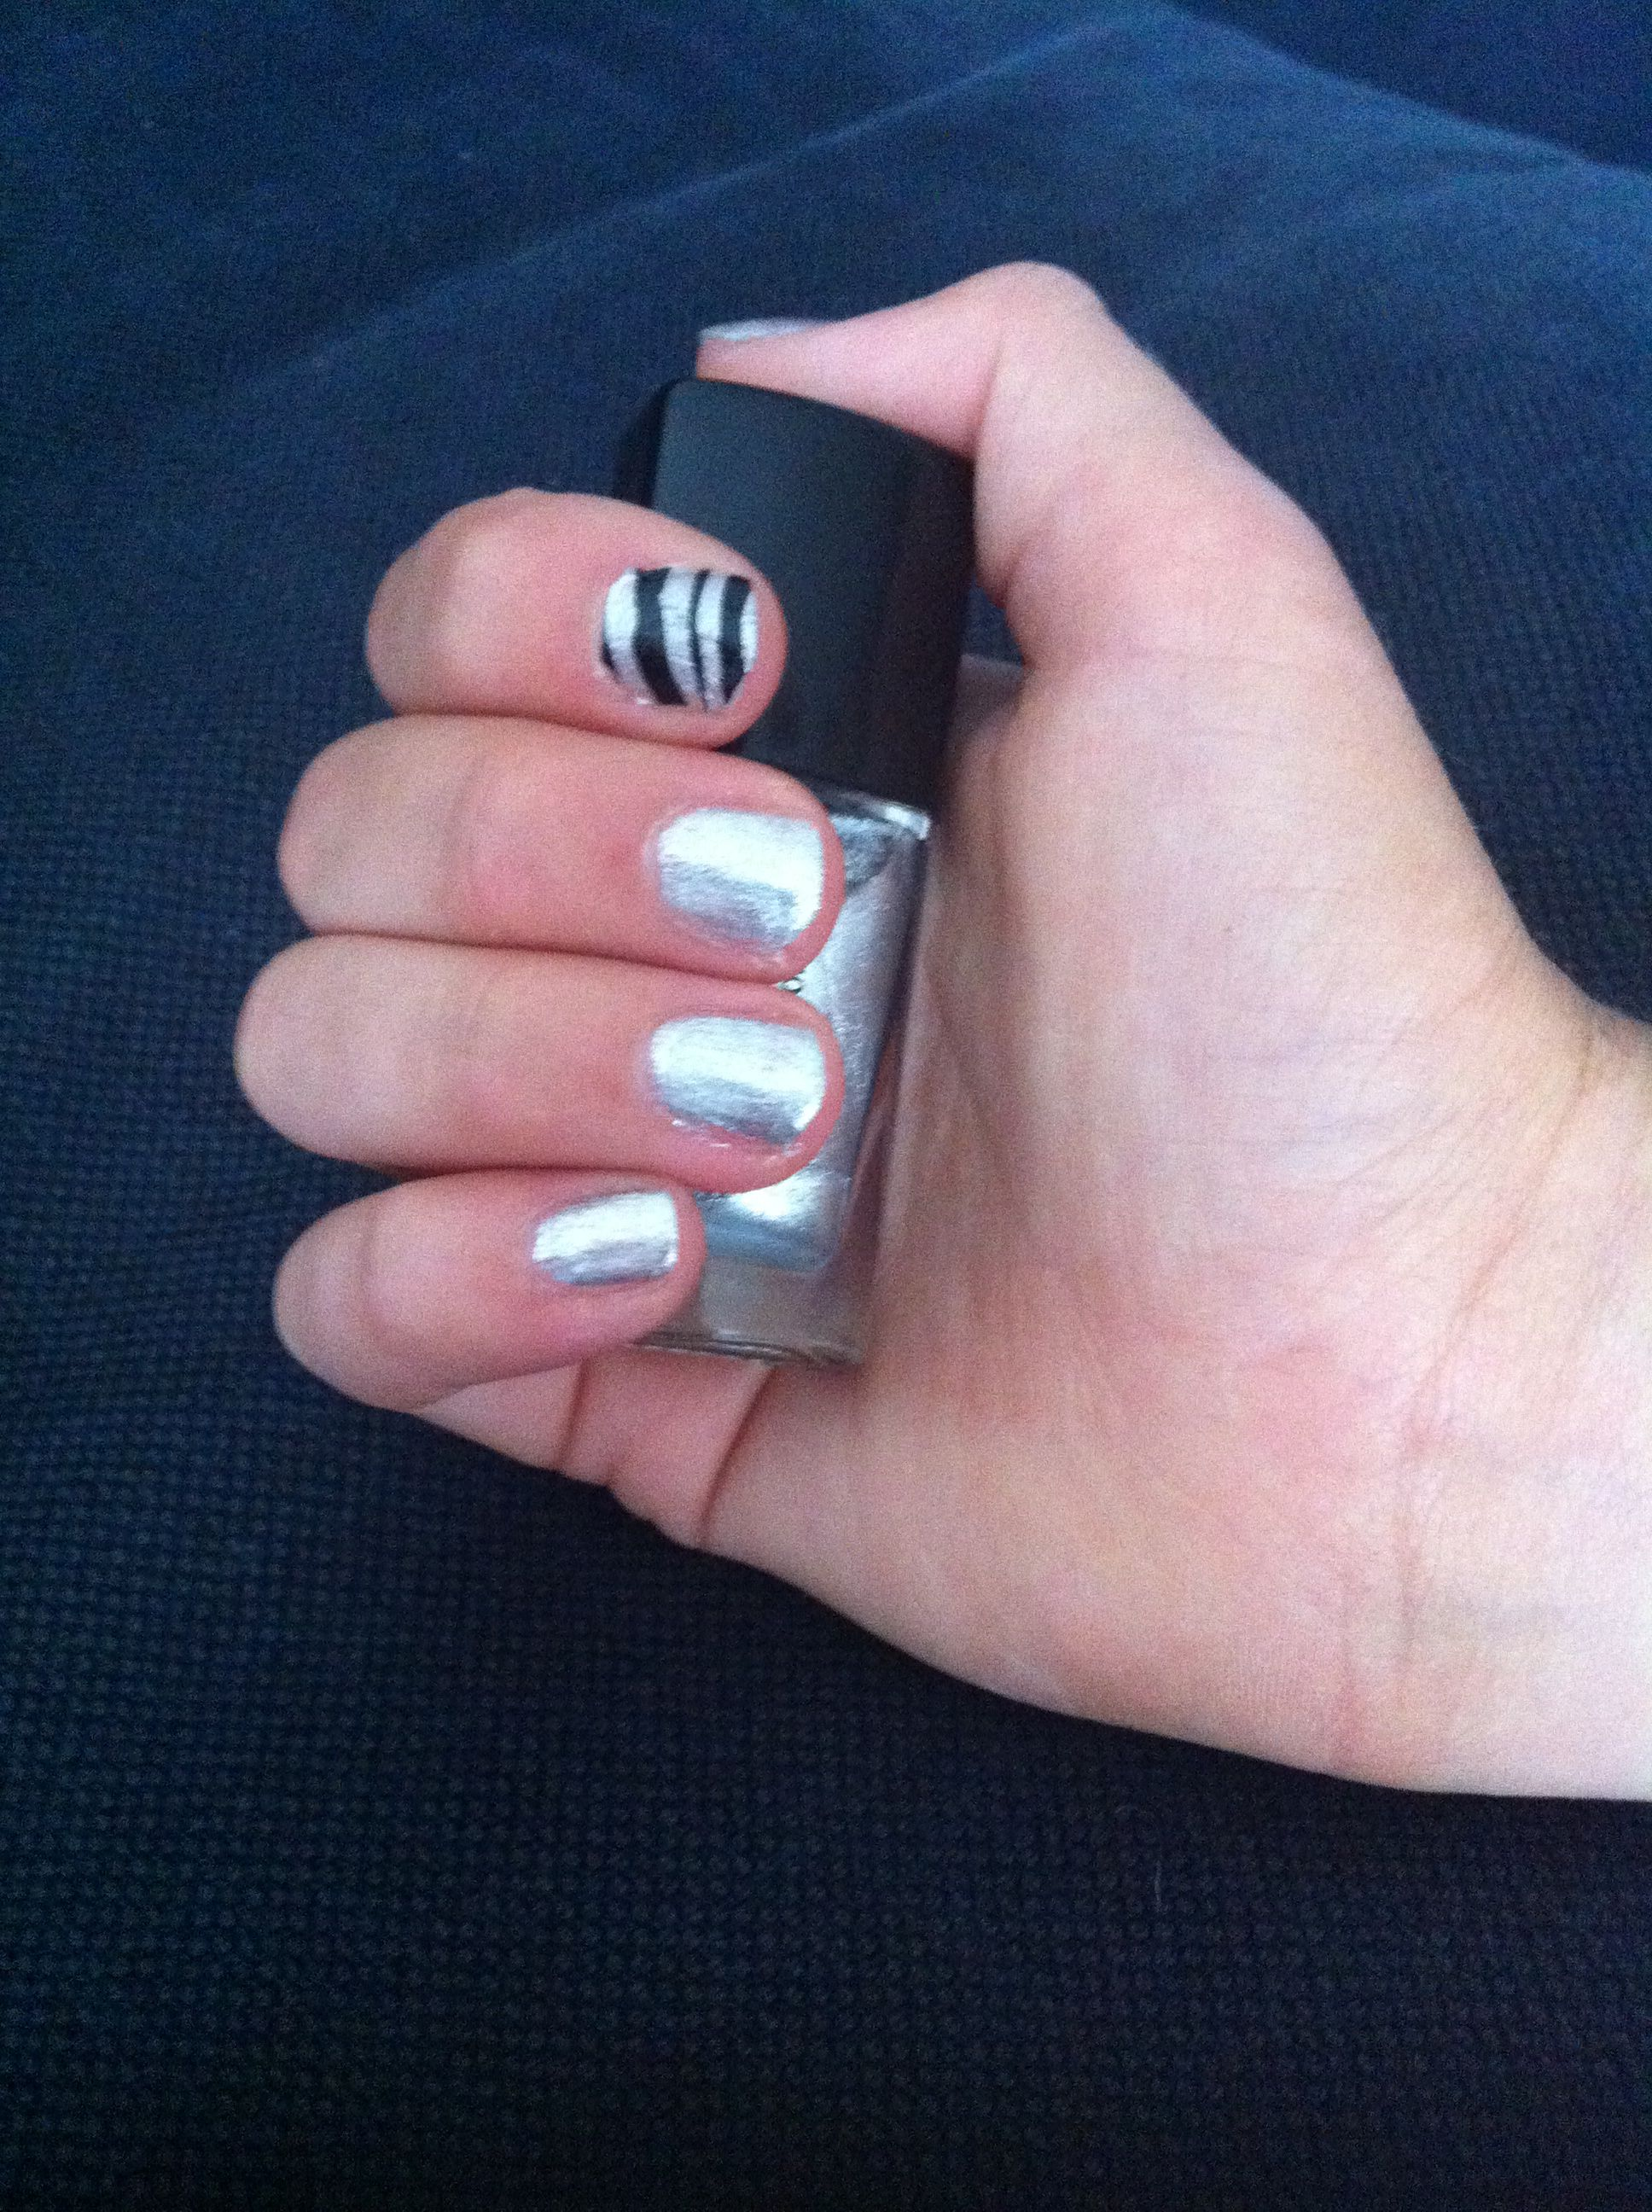 Leuke makkelijke nail art voor korte nagels - nailzzz | Pinterest ...